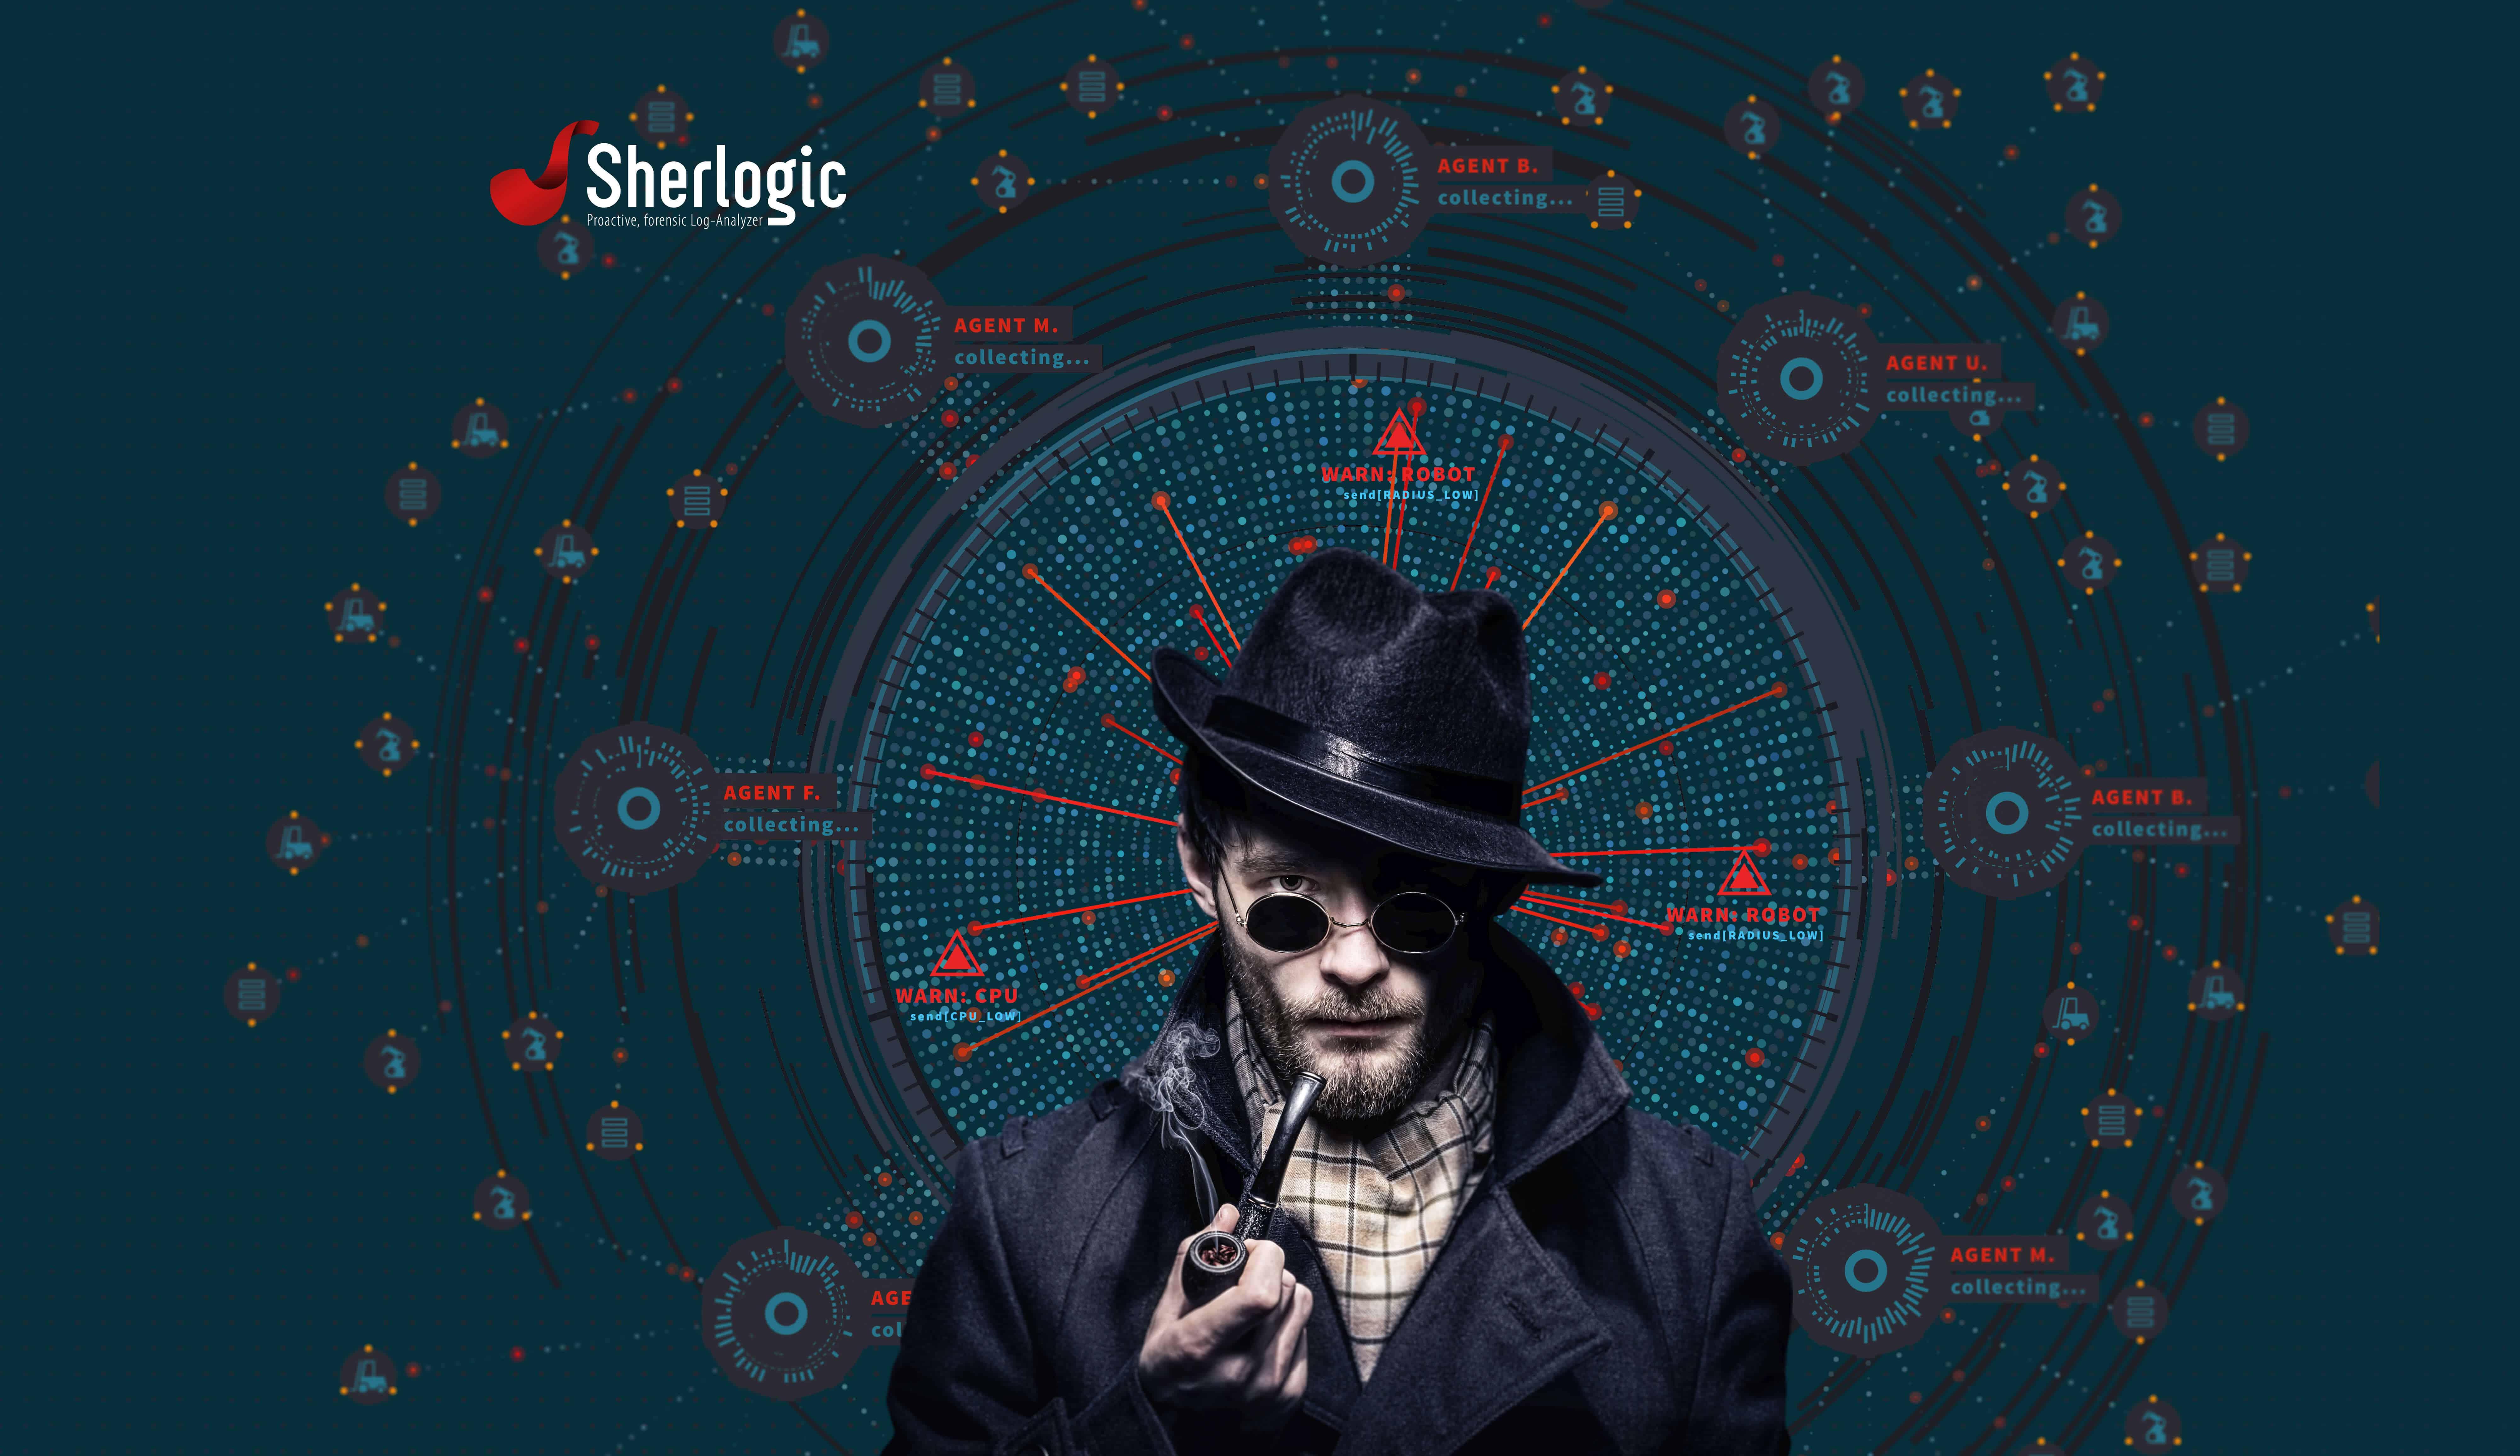 Sherlogic_Aufbereitung_01